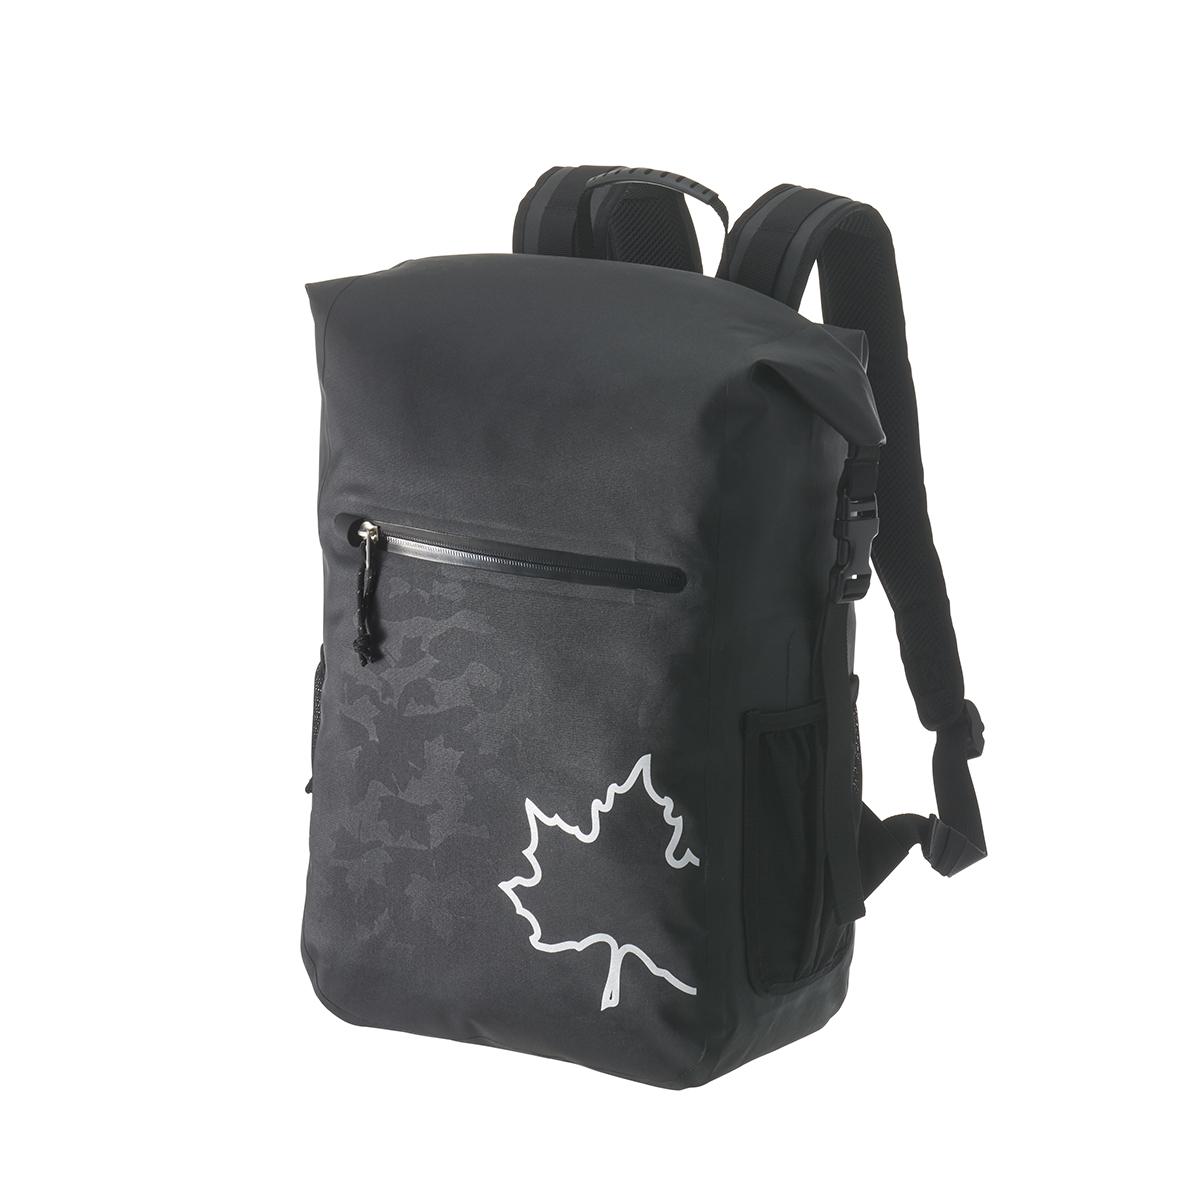 【LOGOS】SPLASH mobi スモールダッフルリュック25 (ブラックカモ)